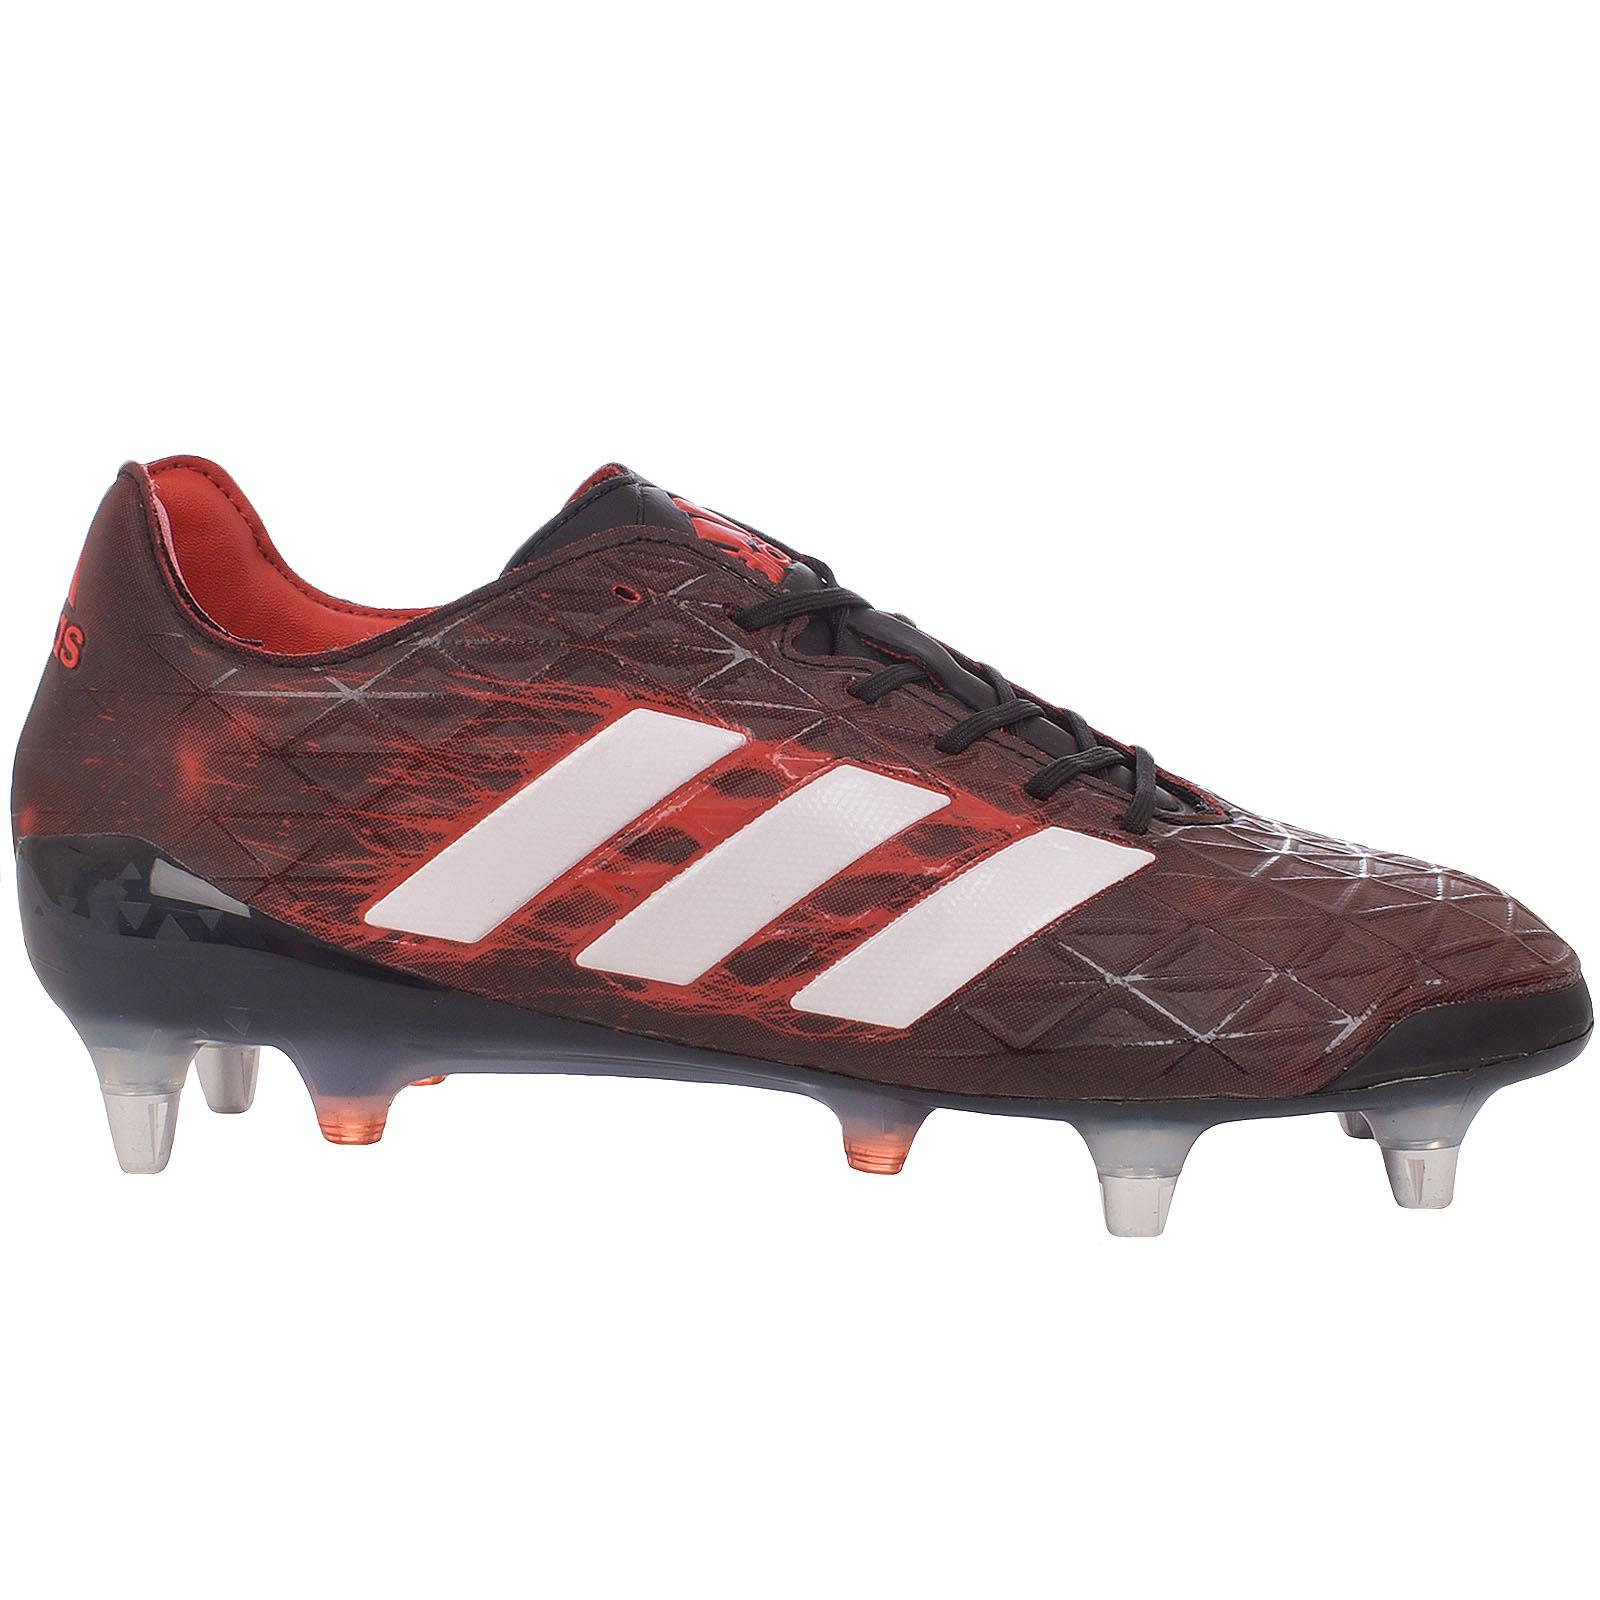 brand new 7a86a f87c6 adidas Performance Mens Kakari Light SG Soft Ground Rugby Boots ...